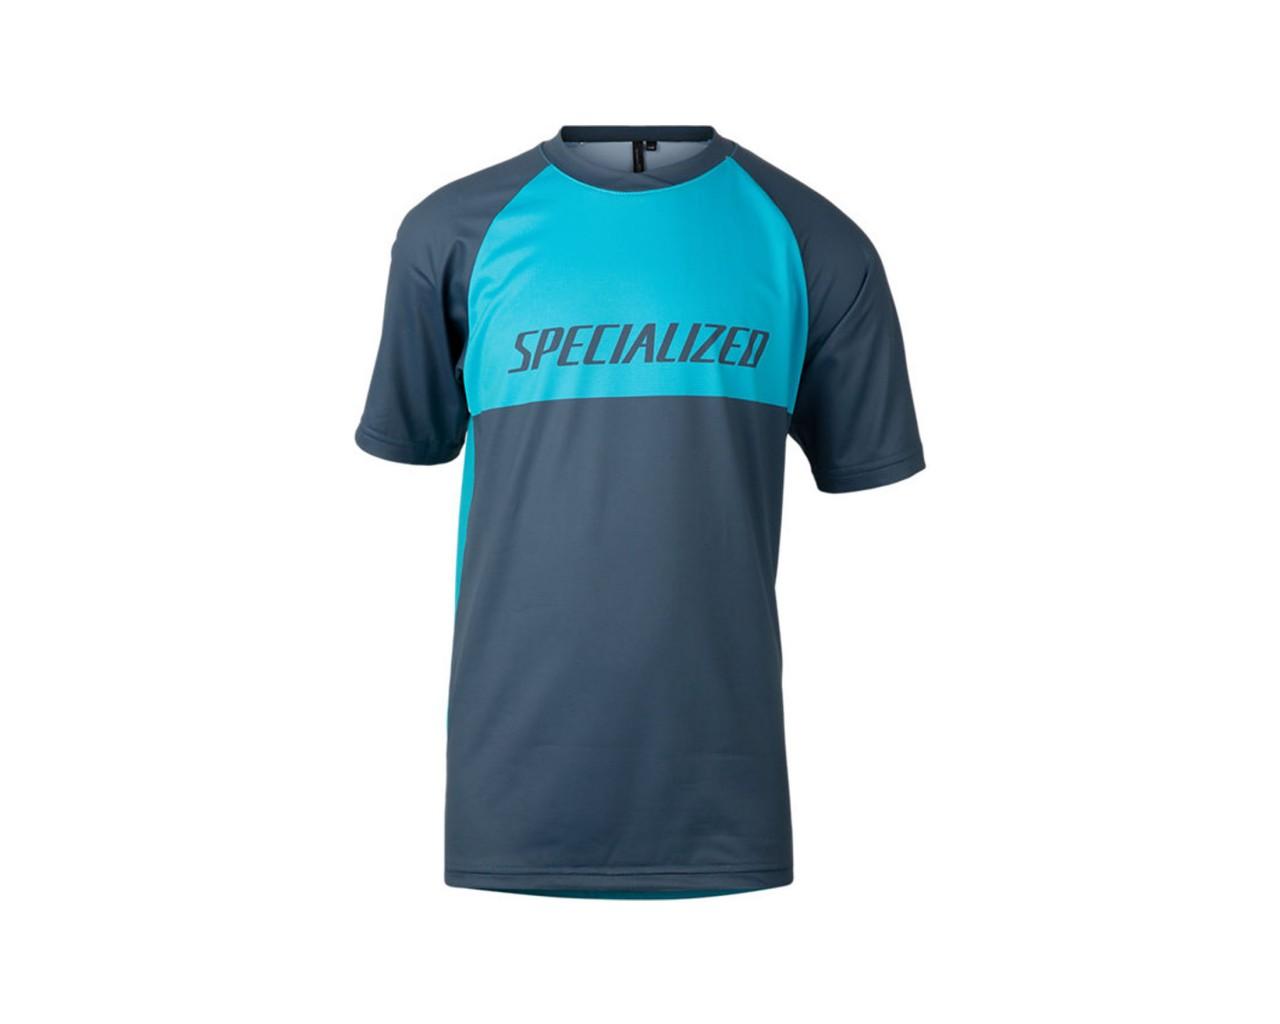 Specialized Enduro Grom Jersey Youth Short Sleeve   aqua-cast blue block